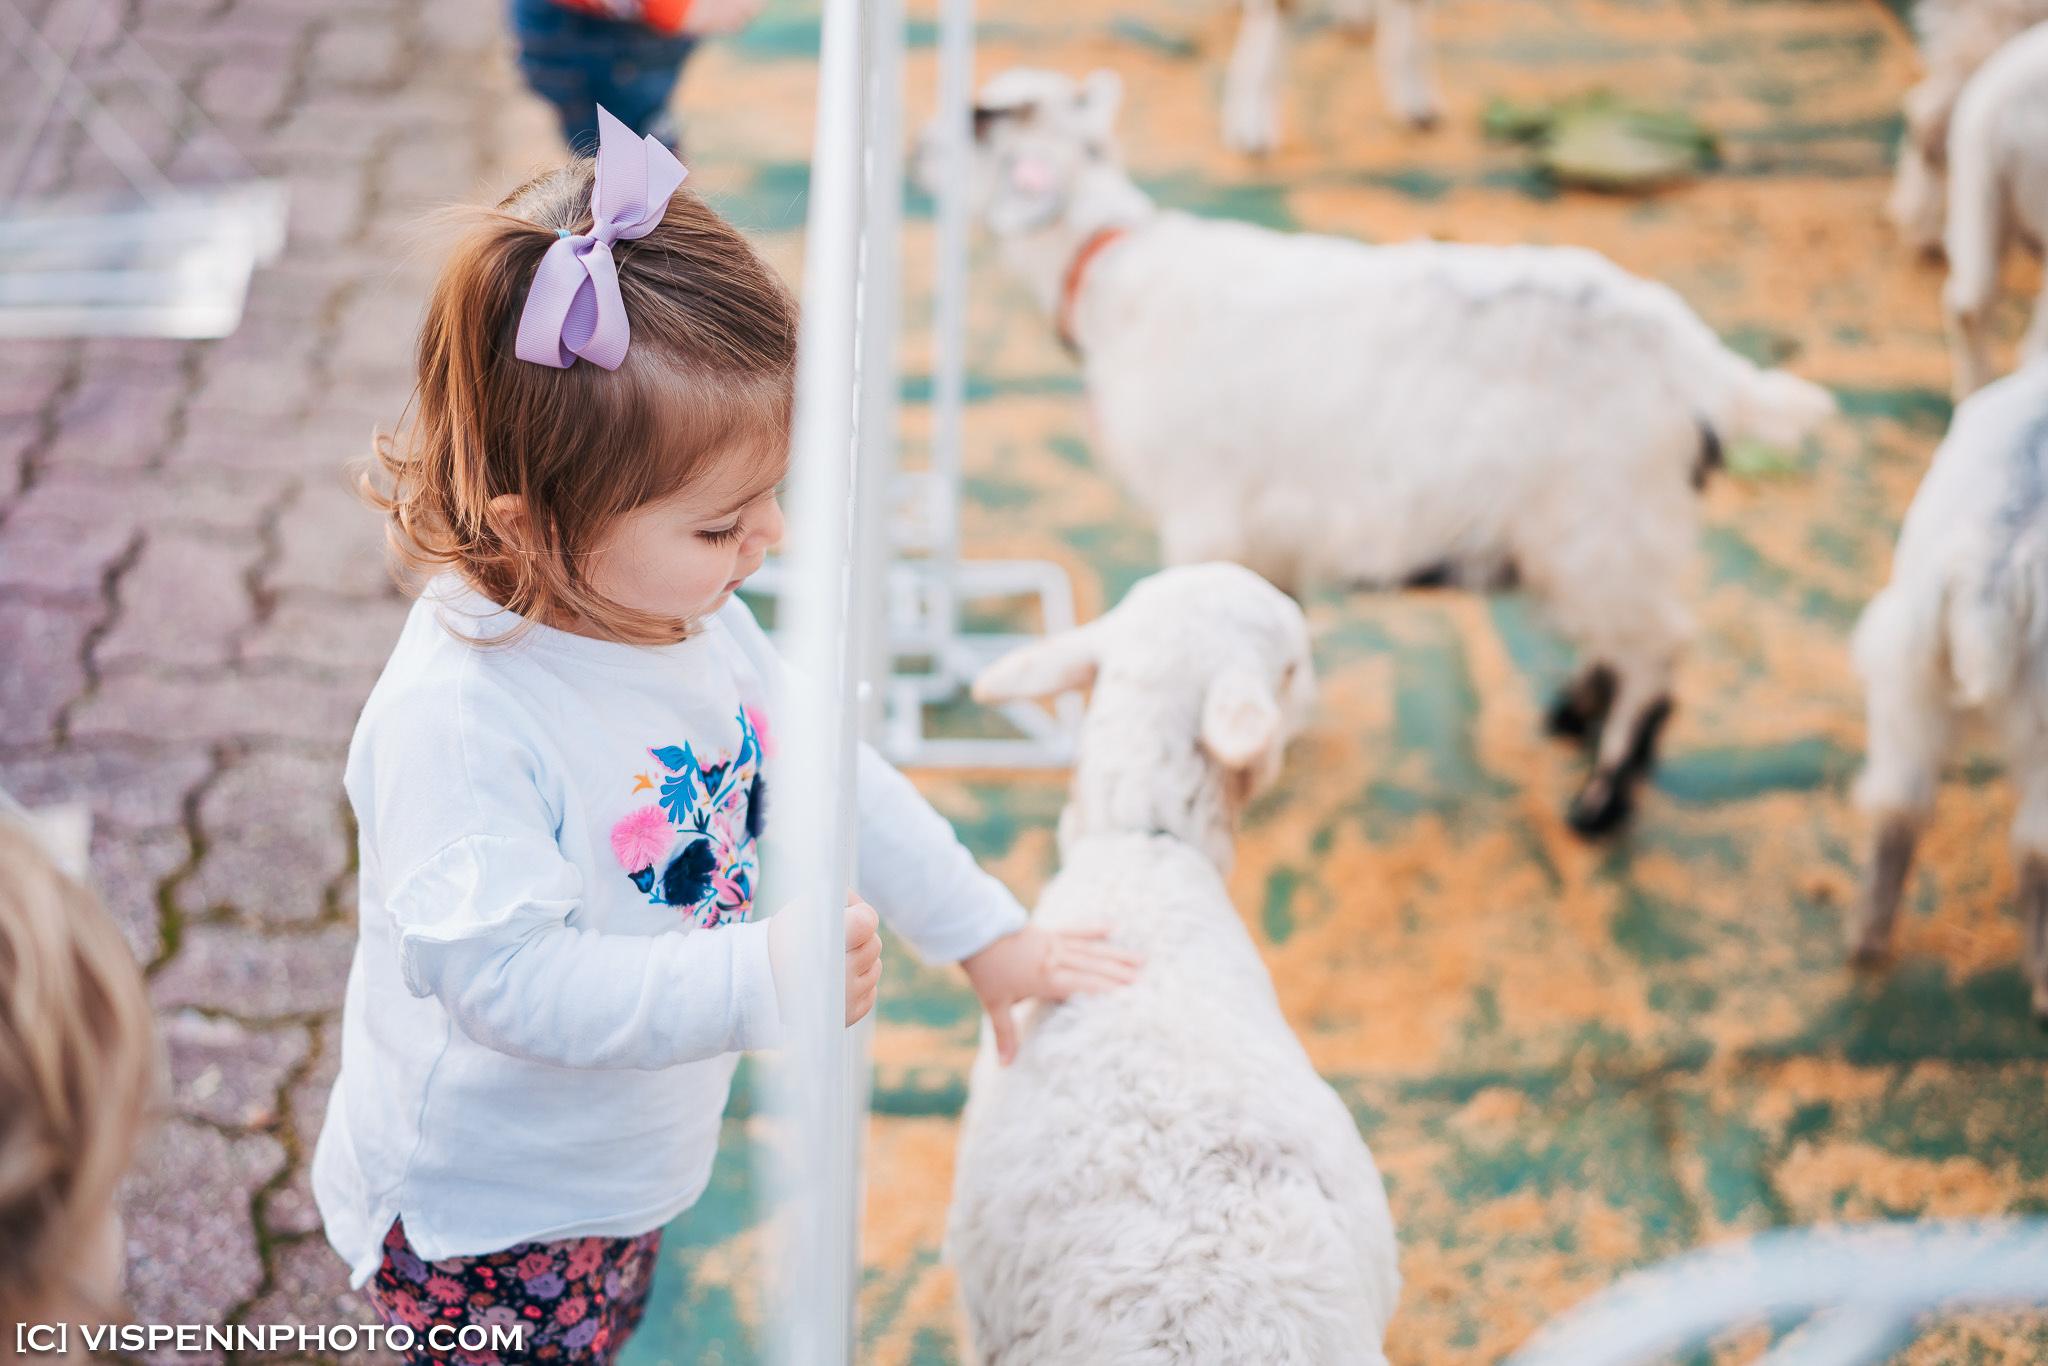 Melbourne Baby Family Birthday Party Photographer 墨尔本 百日宴 满月宴 周岁宴 摄影 VISPENN Biostime 0702 Sony VISPENN